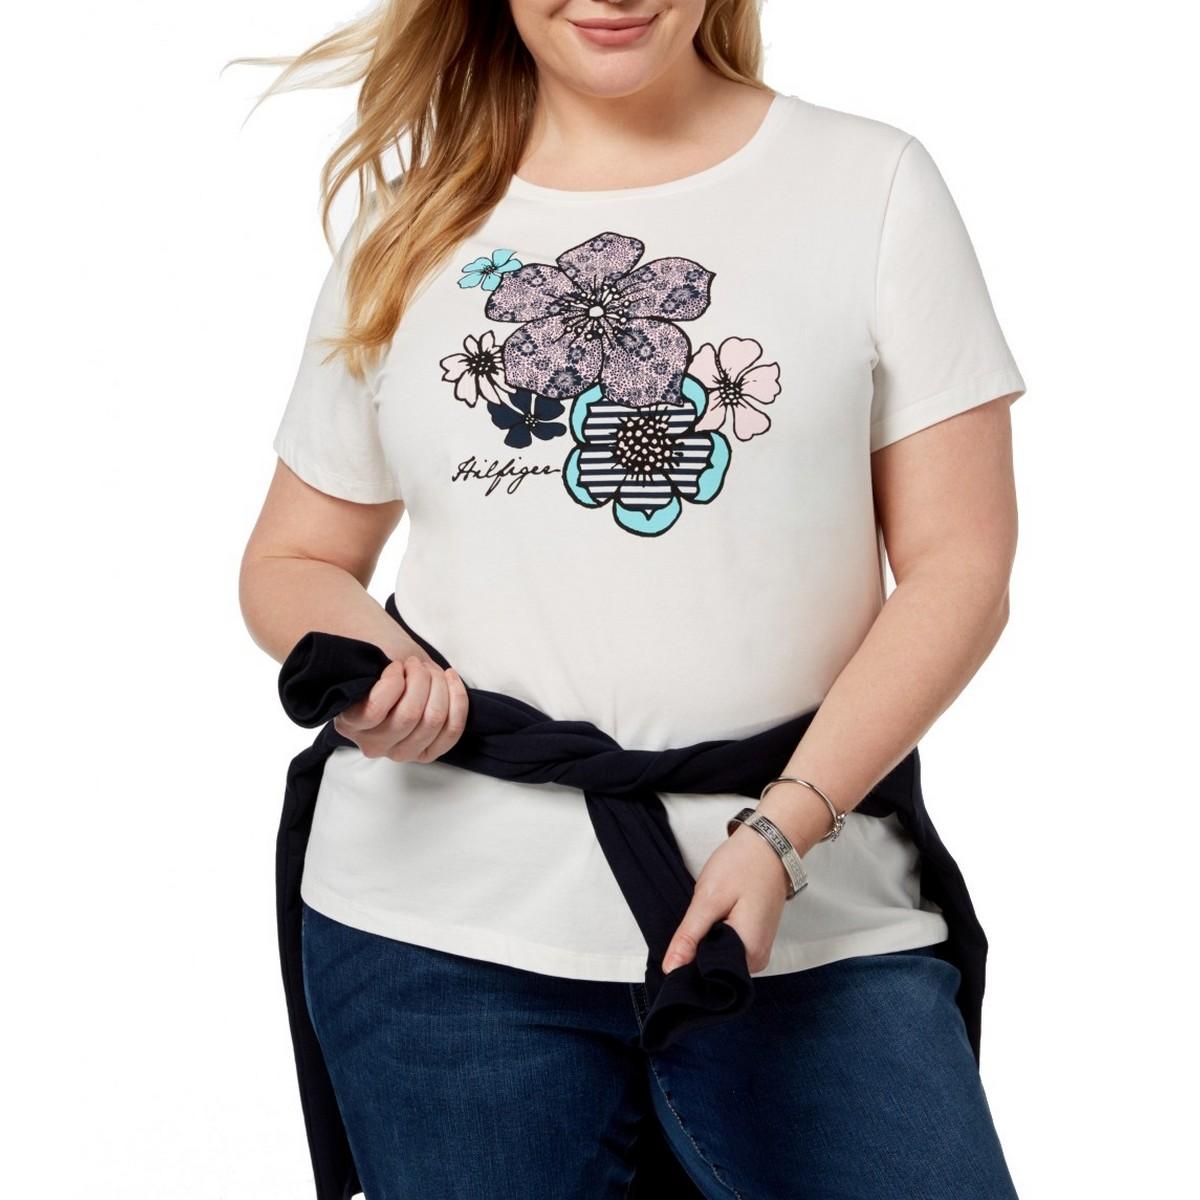 fc7de76a Details about TOMMY HILFIGER NEW Women's Ivory Plus Size Floral Print  Casual Shirt Top 2X TEDO